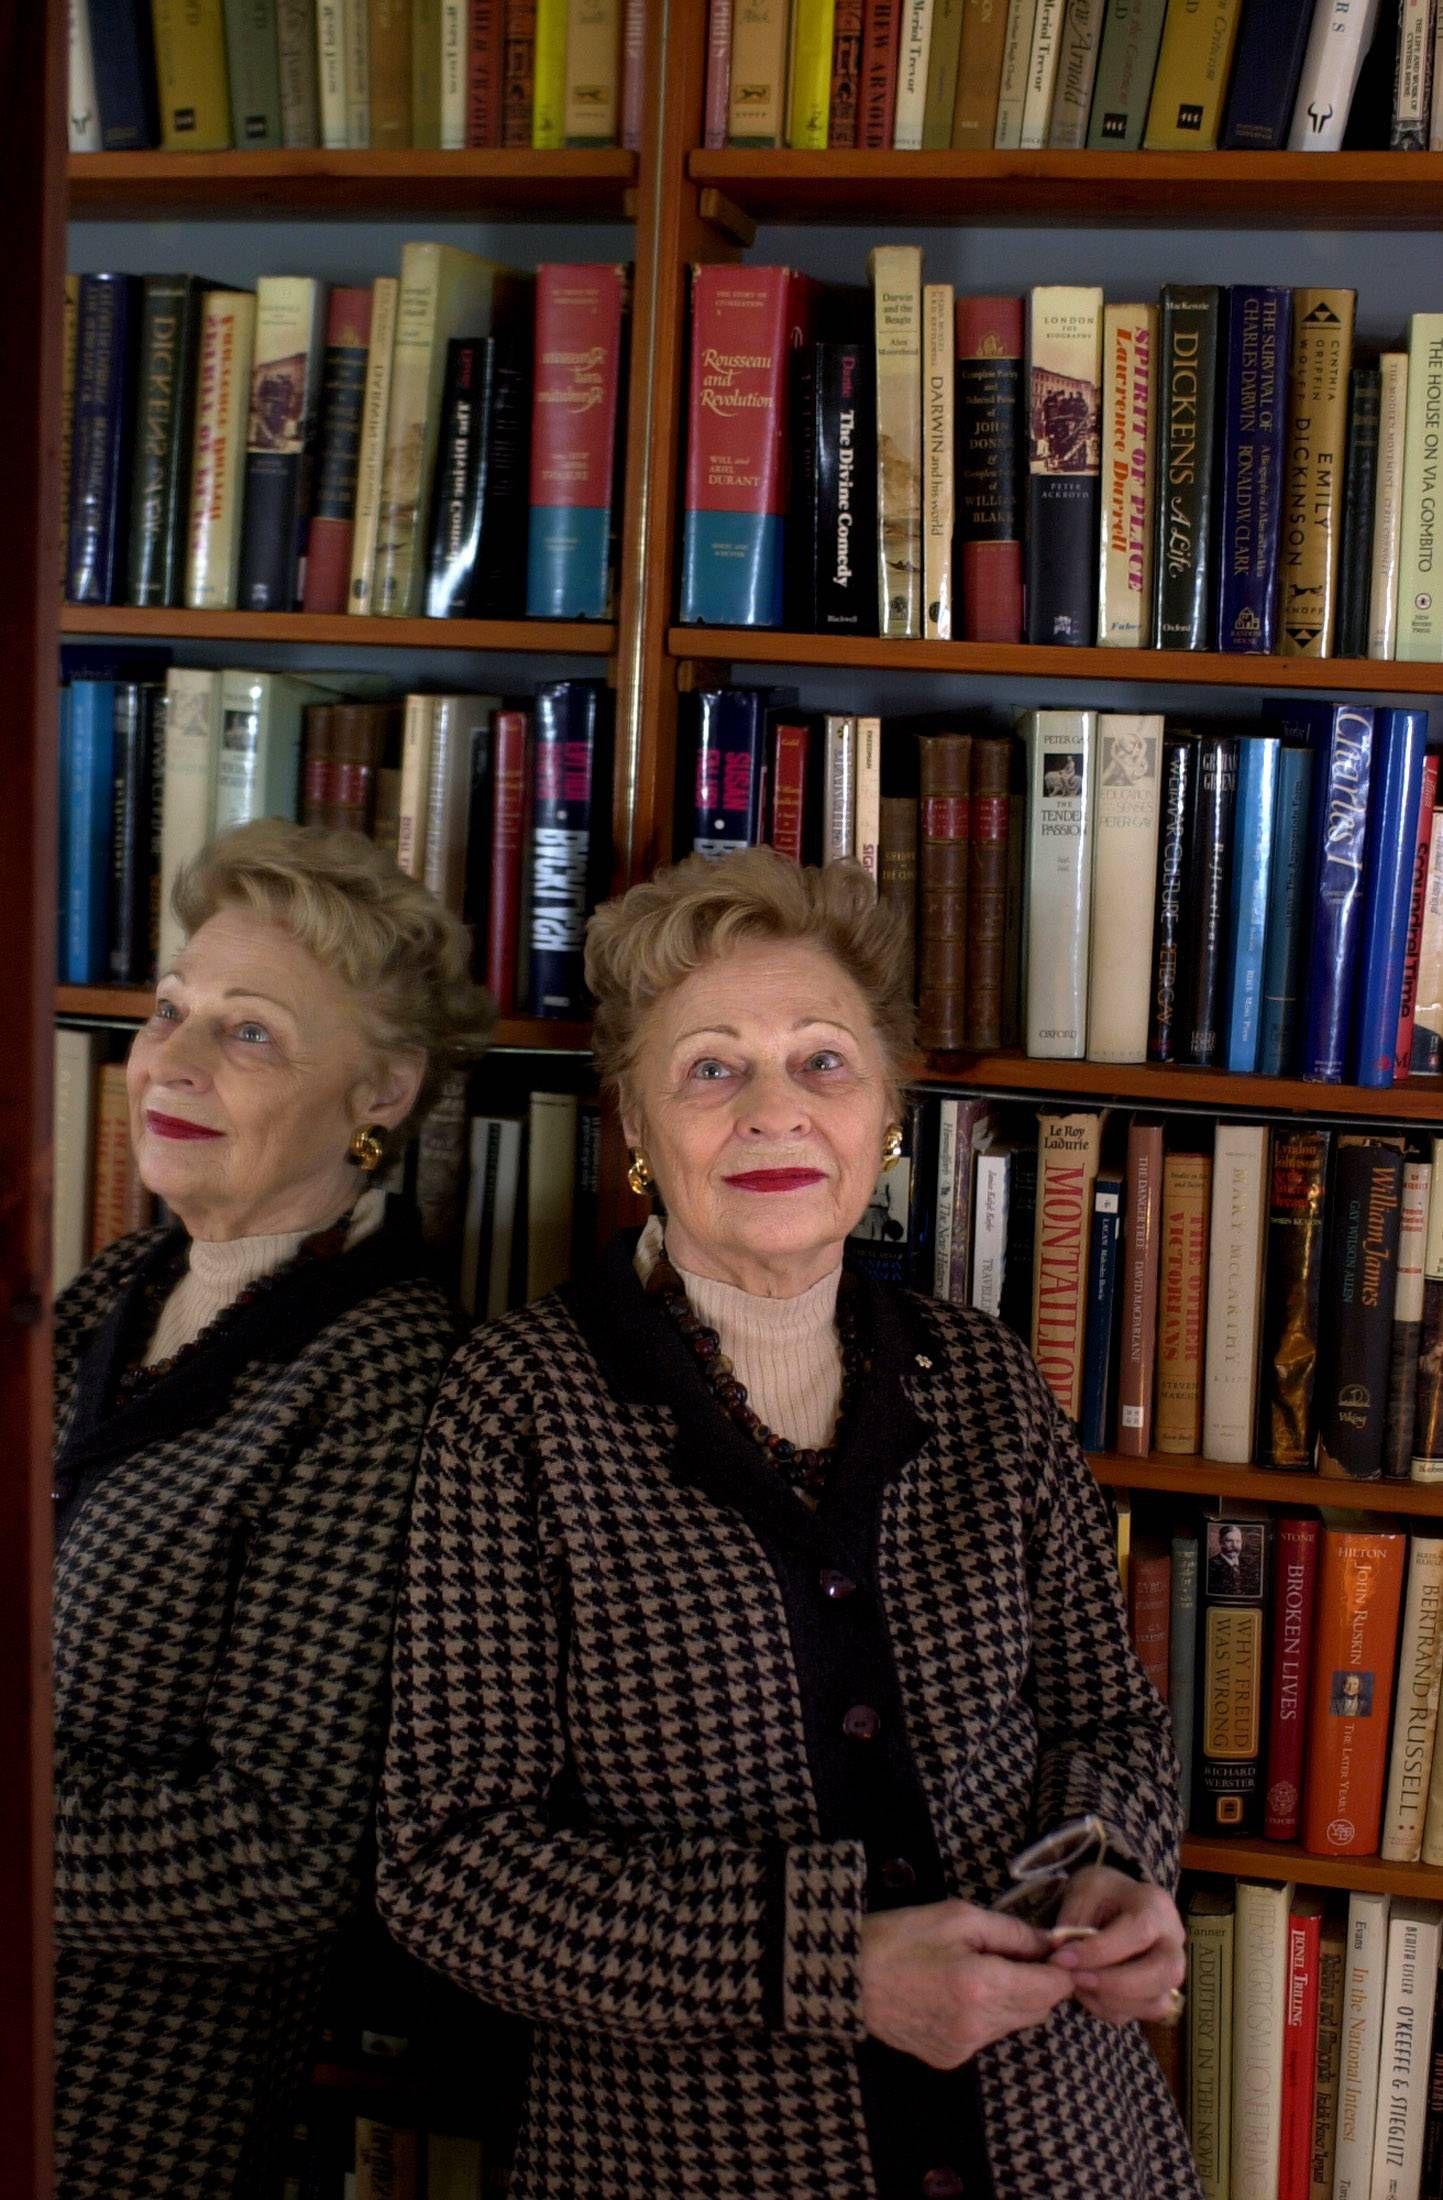 Phyllis Grosskurth: Brilliant biographer relished a challenge